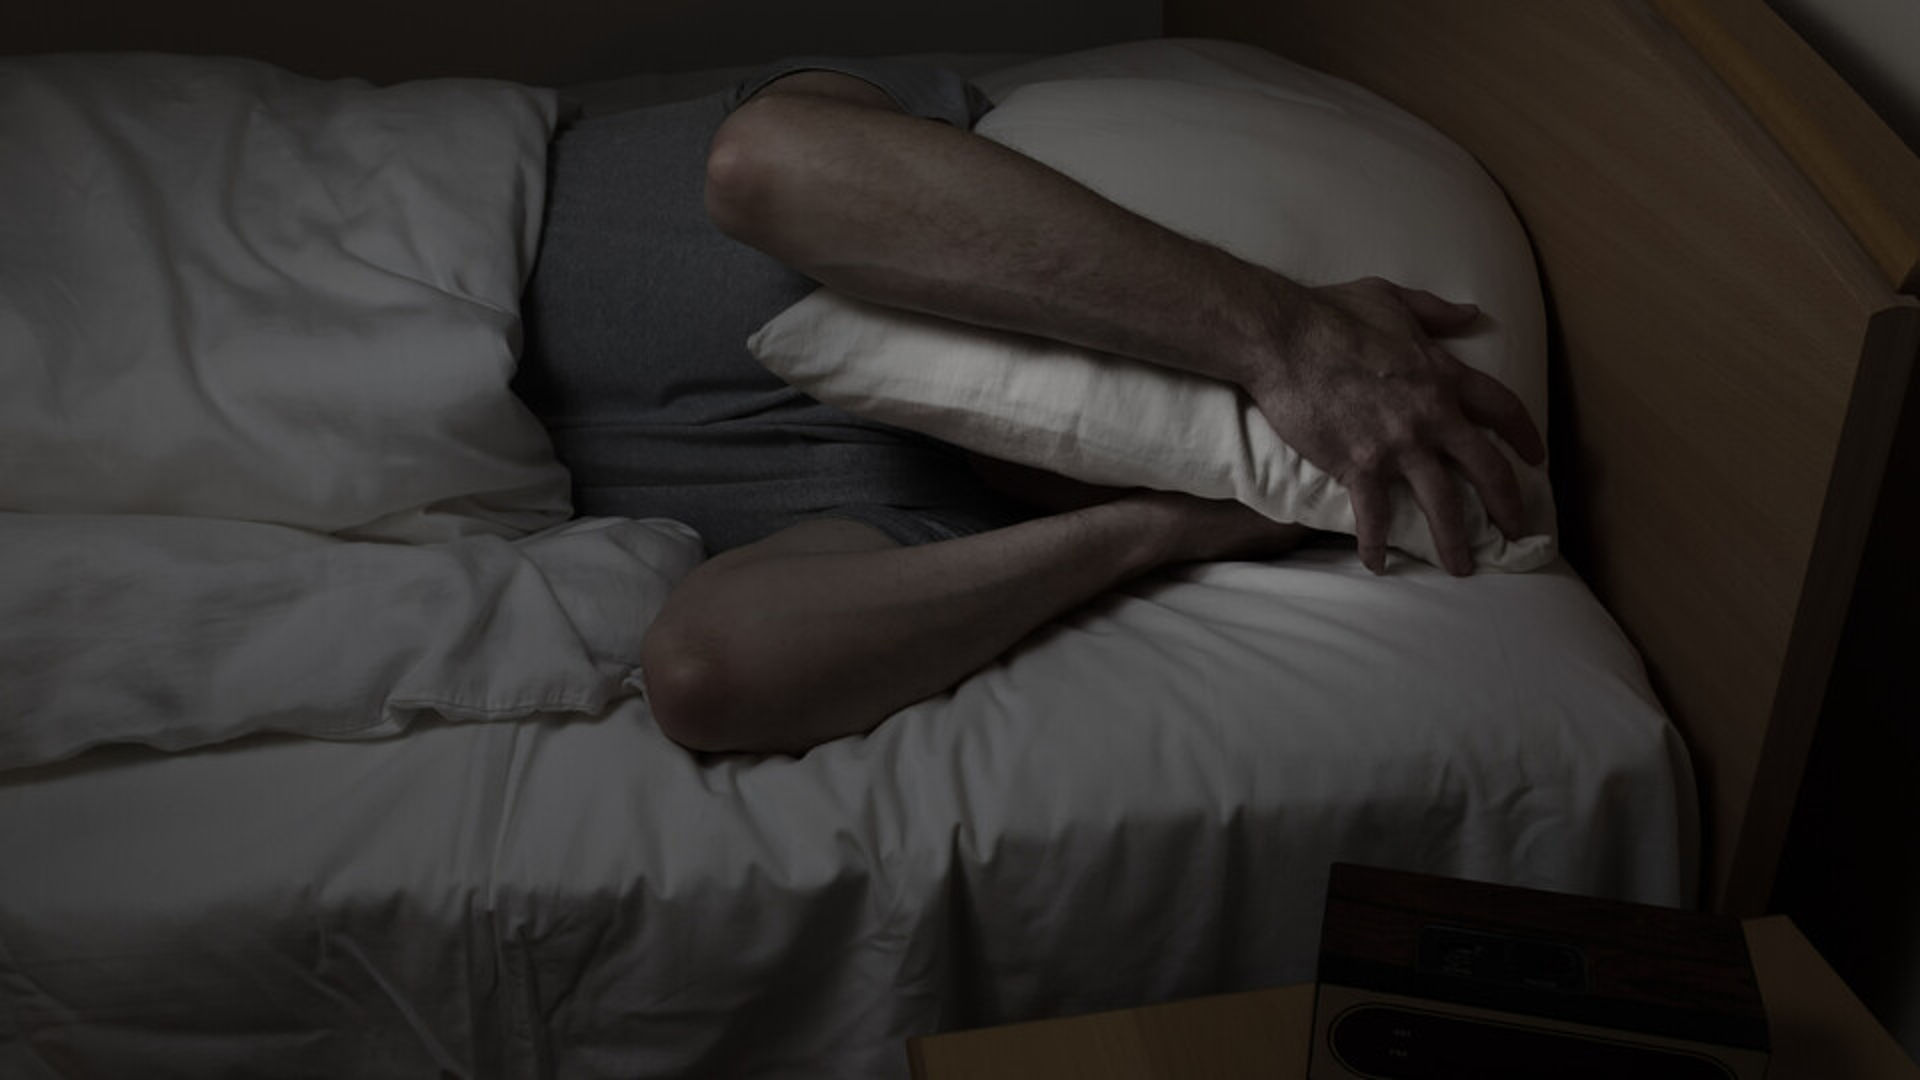 akoestiek, slapen, bed, geluidoverlast, sleeping, acoustics, noise, disturbance